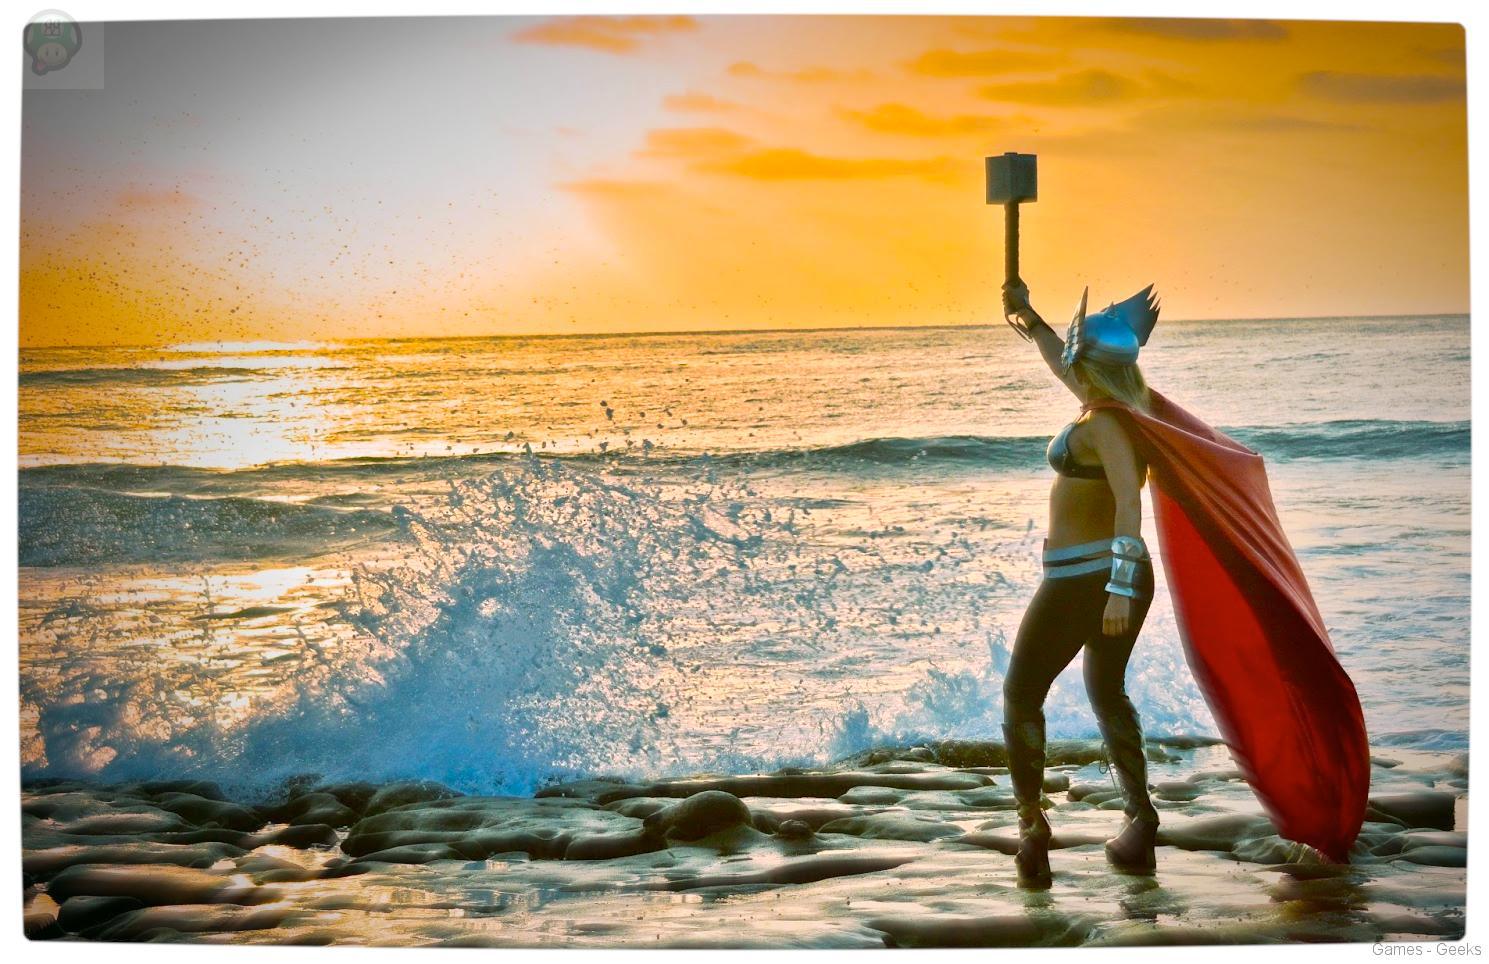 Vamers-Geekosphere-Thorsday-Toni-Darling-Gender-Bends-Thorsday-Toni-Darling-as-Thor-12 Cosplay - Lady Thor #25